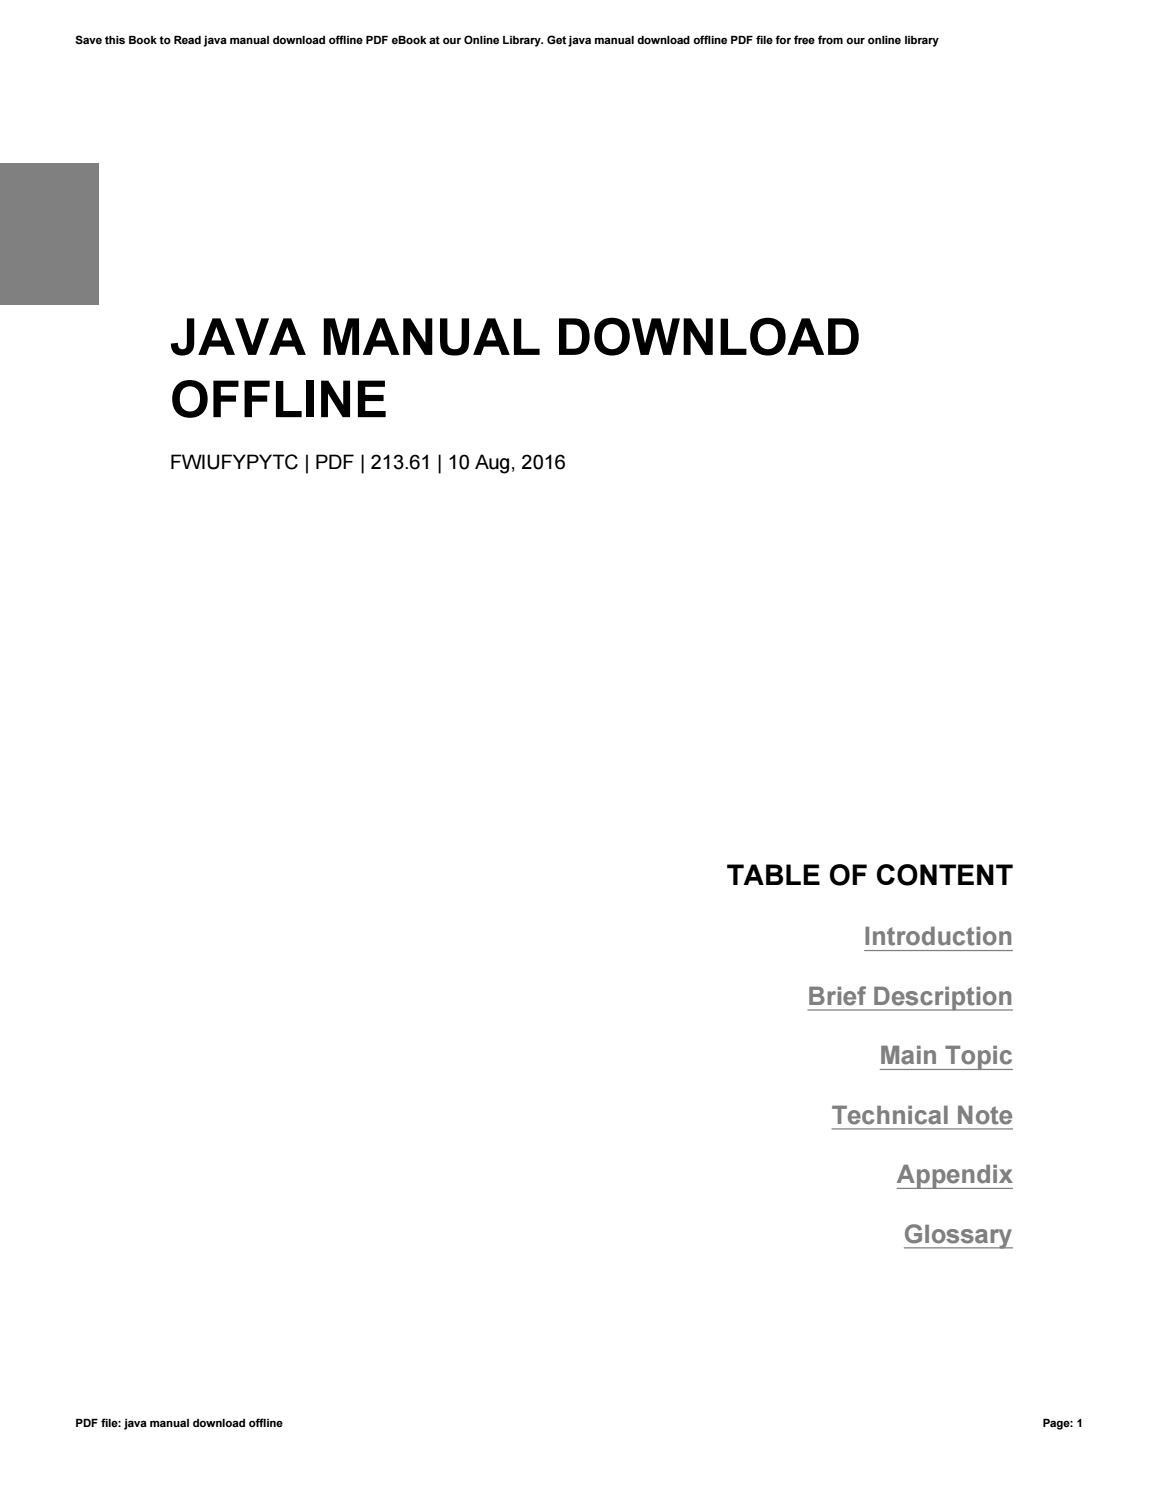 Java manual download offline by CorneliaCurtis1767 - issuu